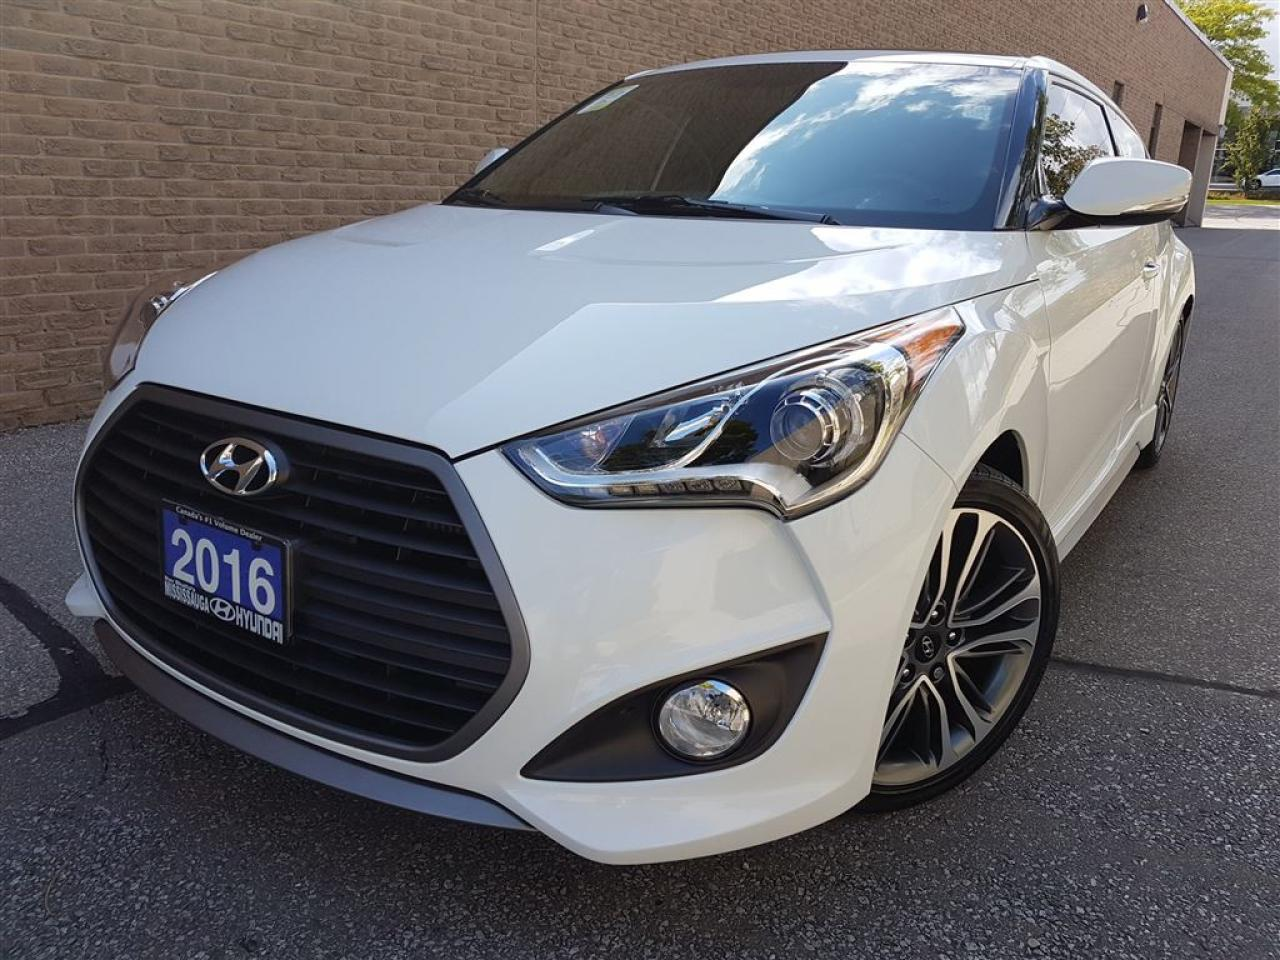 Photo of White 2016 Hyundai Veloster